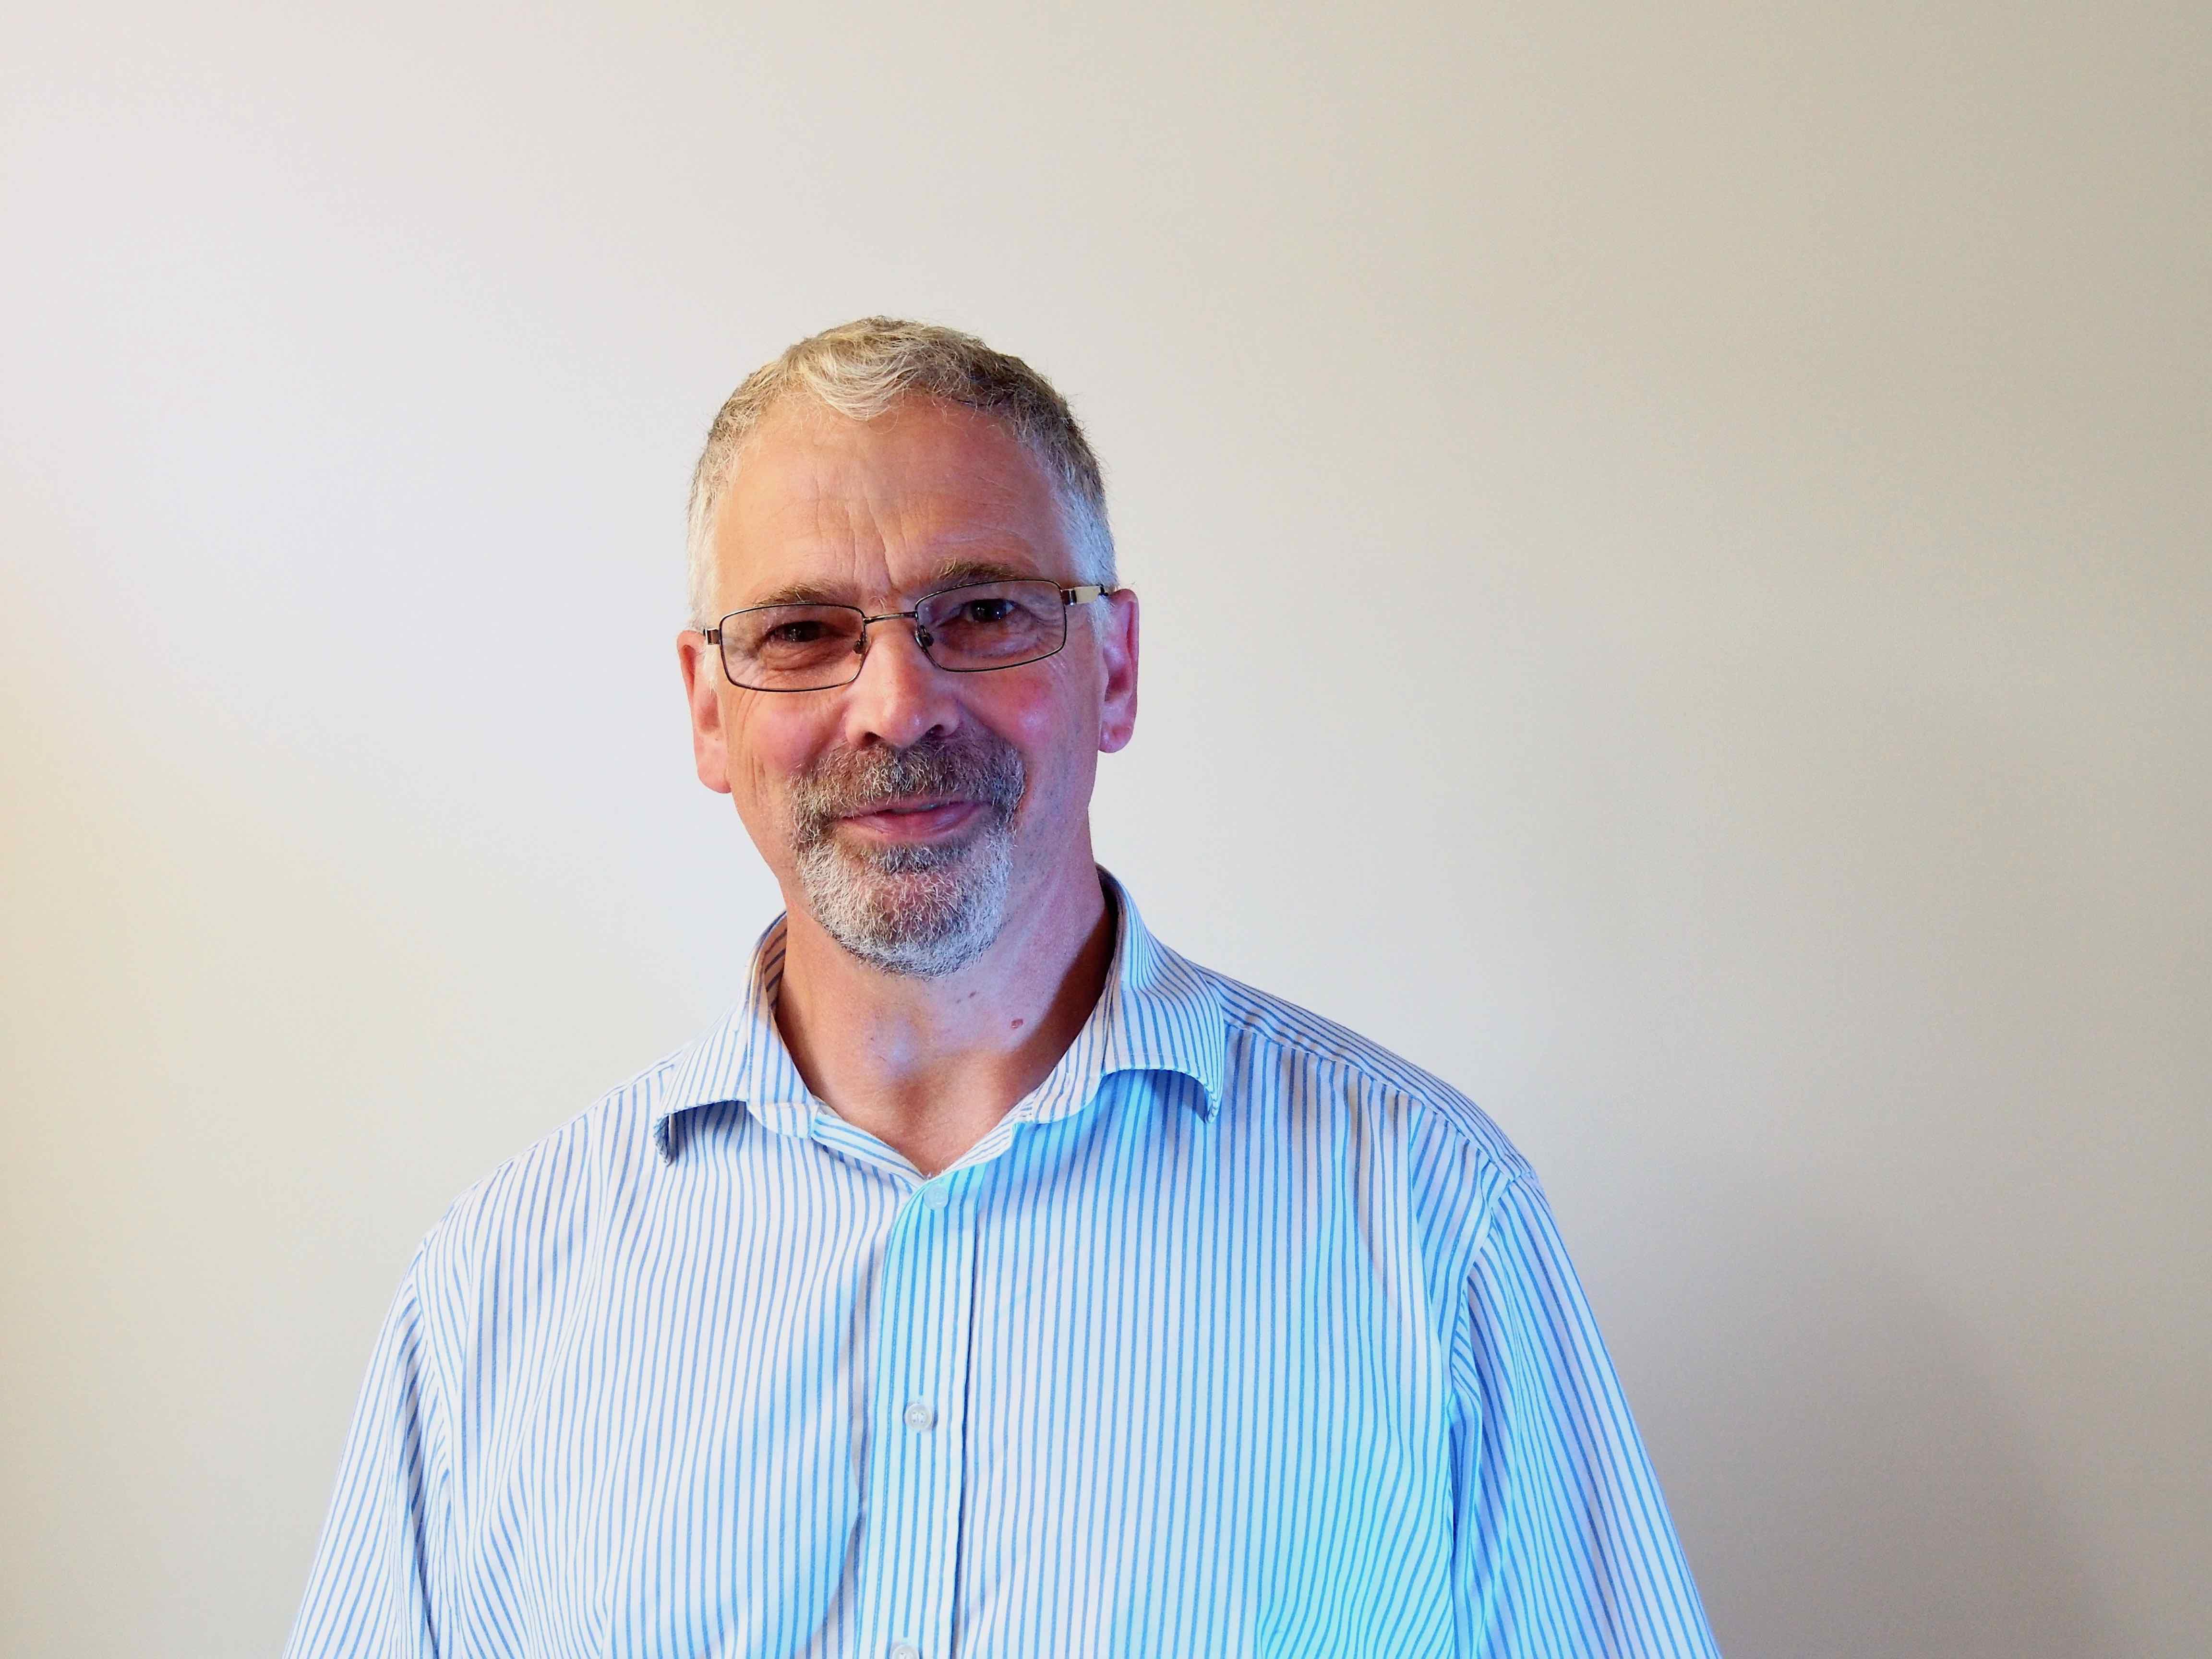 Photograph of Owen James